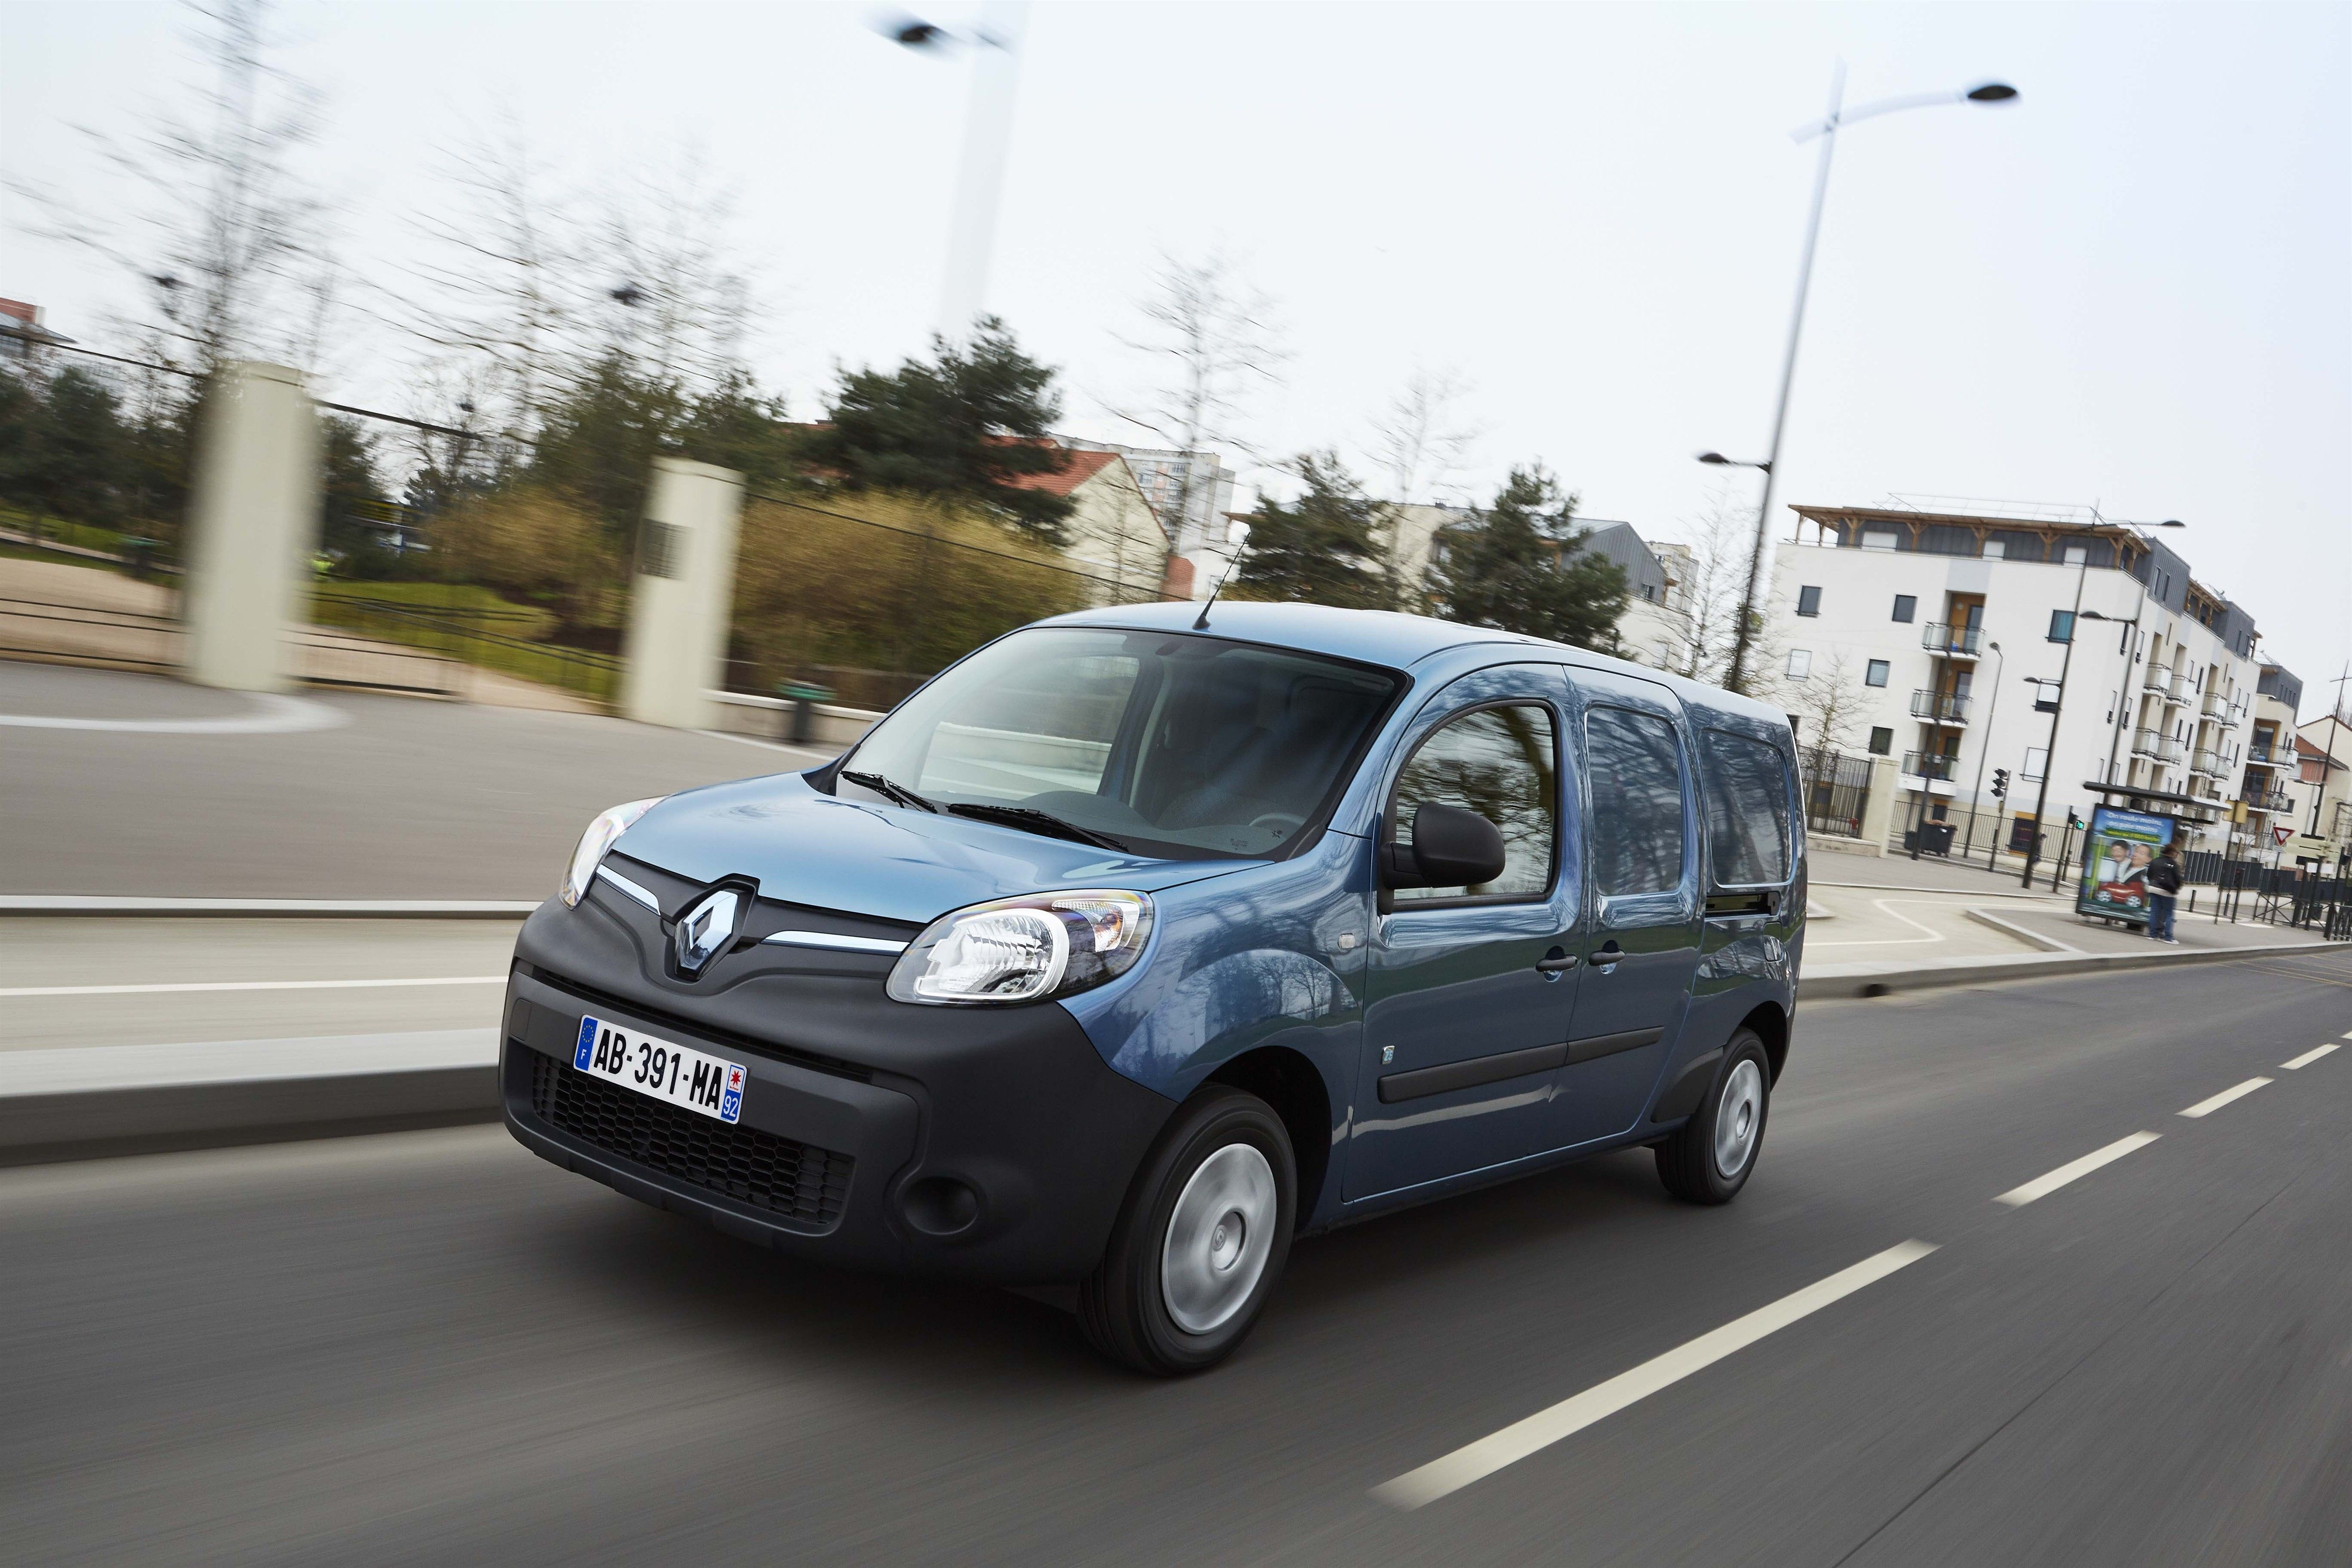 Brazilian Delivery Fleet Testing Renault's Electric Vehicles